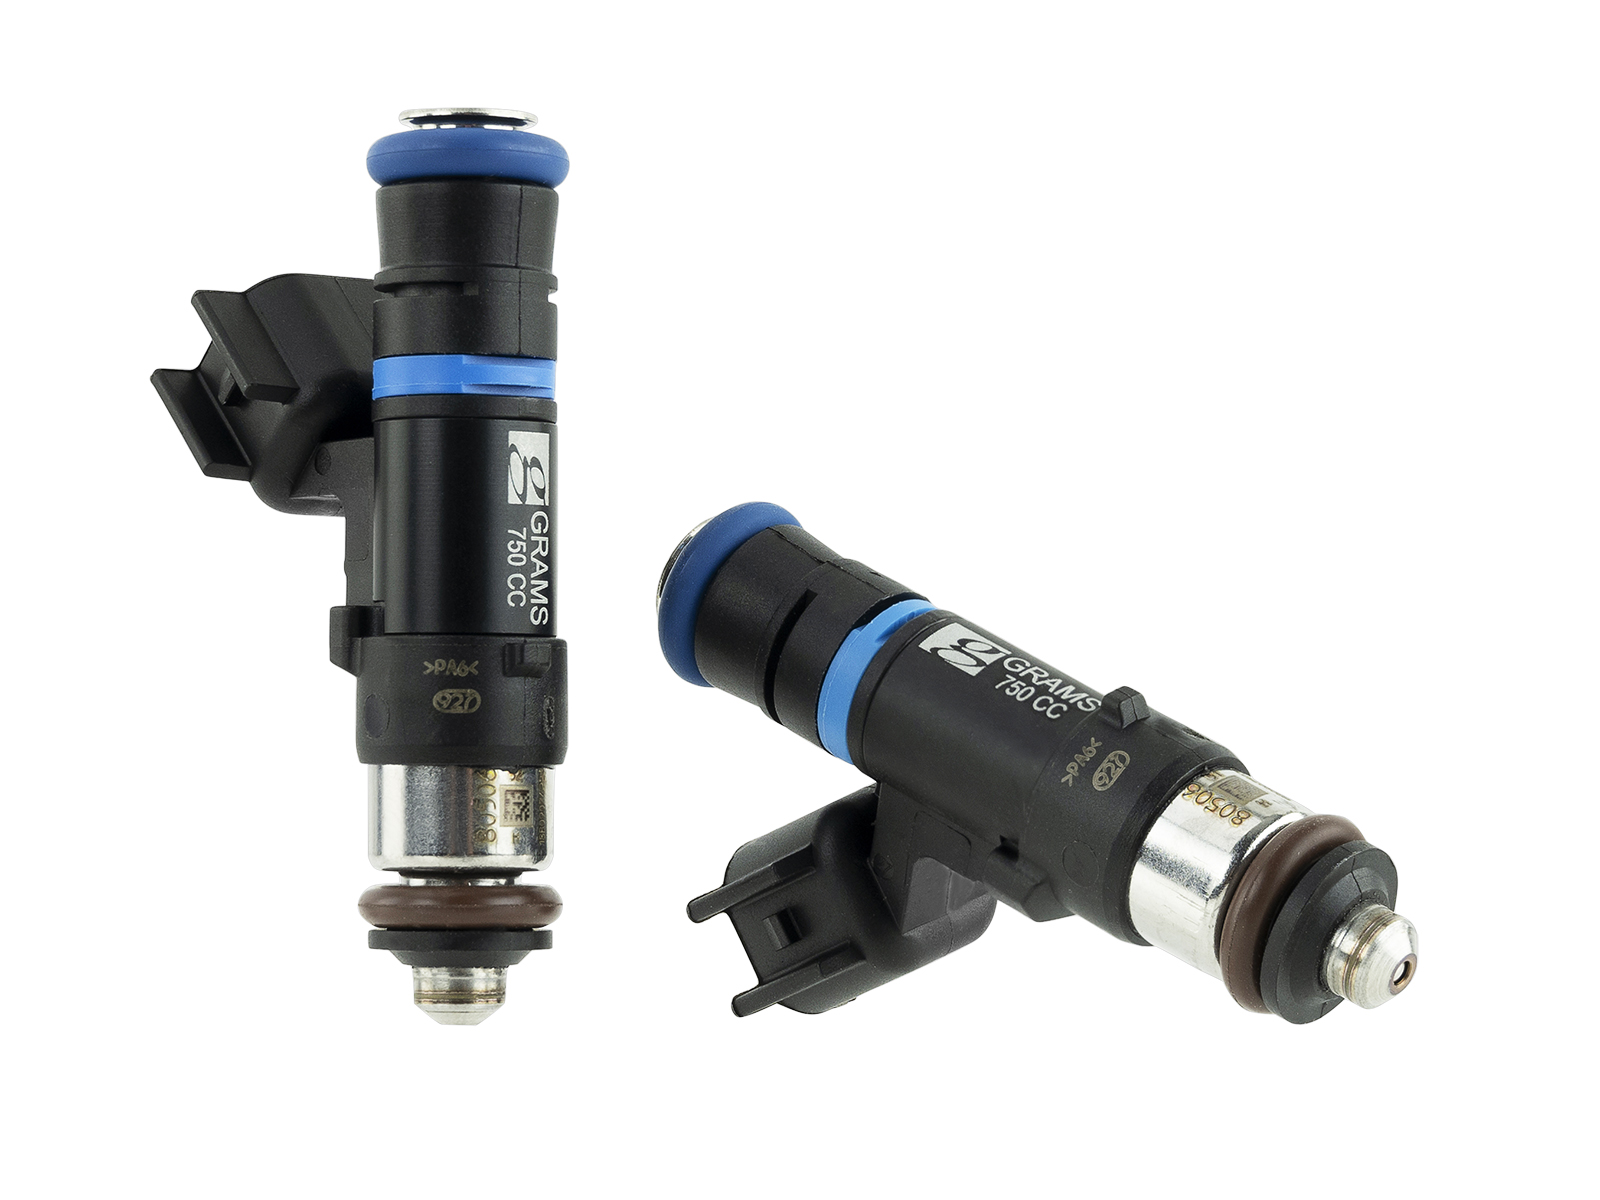 Grams Performance 03-08 Nissan 350Z VQ35 750cc 71 lbs/hr Injector Kit G2-0750-0700